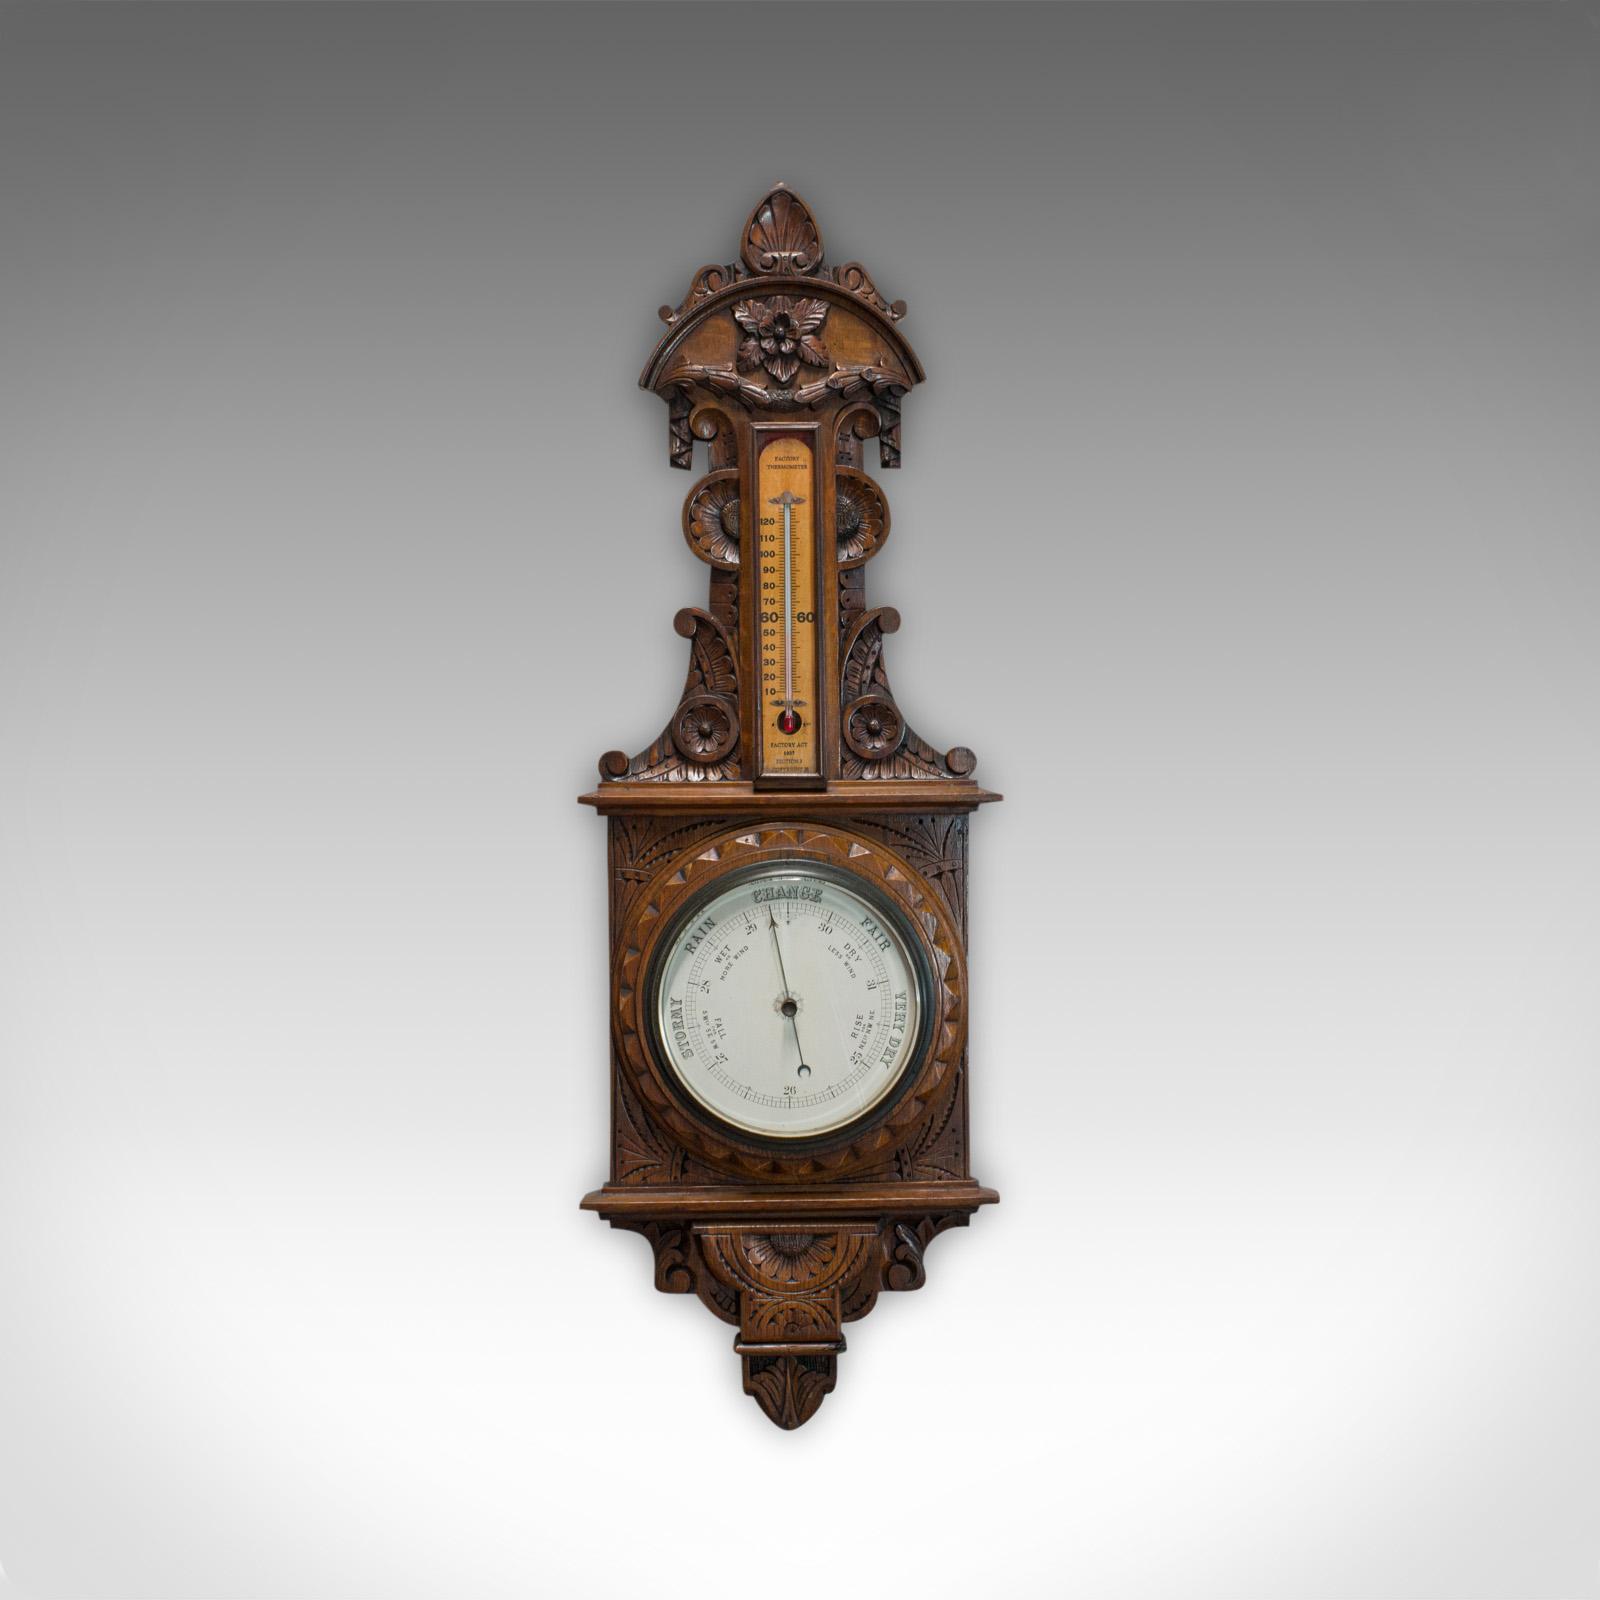 Vintage Factory Barometer, English, Oak, Banjo, Official, Factory Act 1937